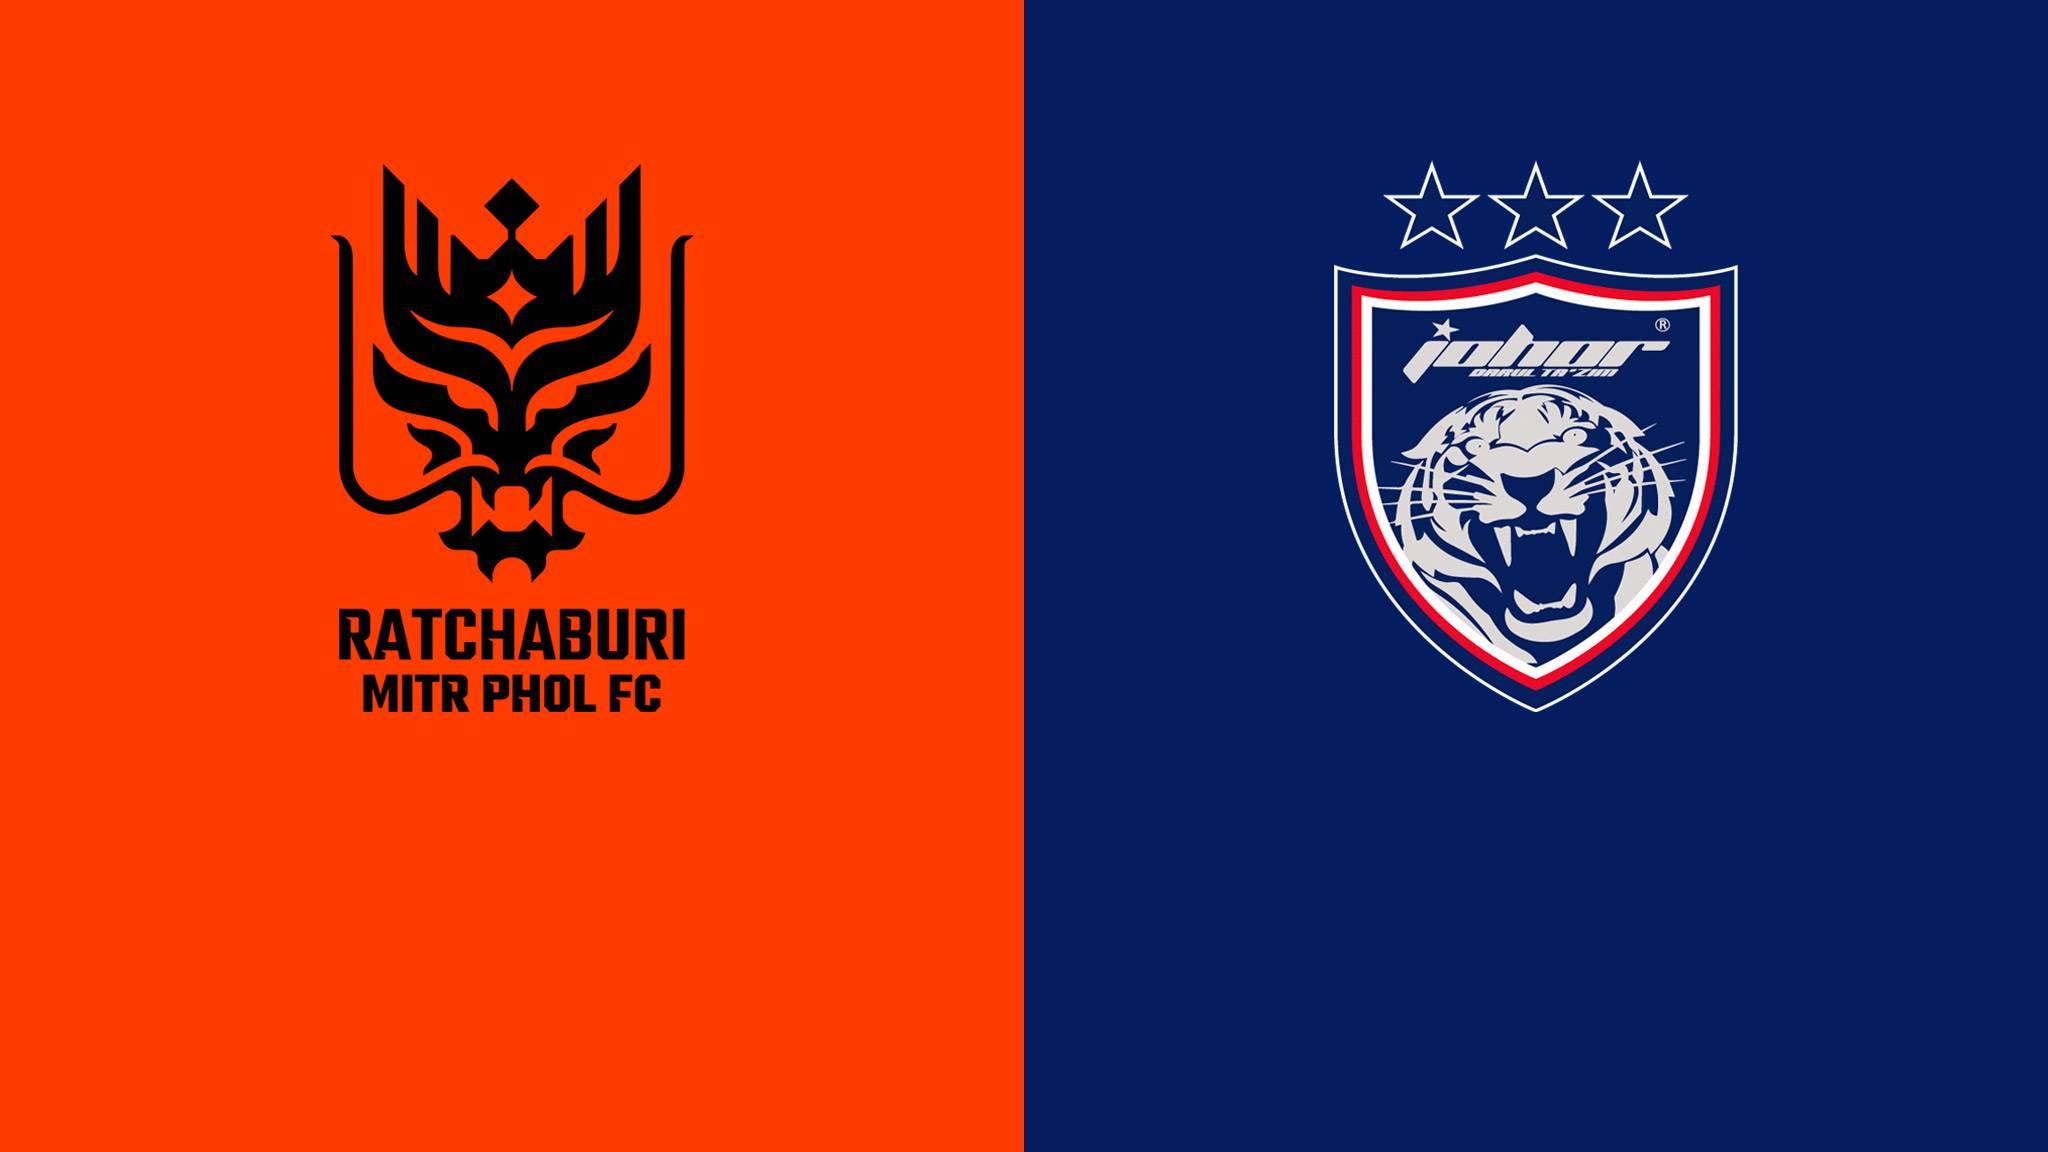 Watch Ratchaburi v Johor Darul Ta'zim Live Stream   DAZN JP